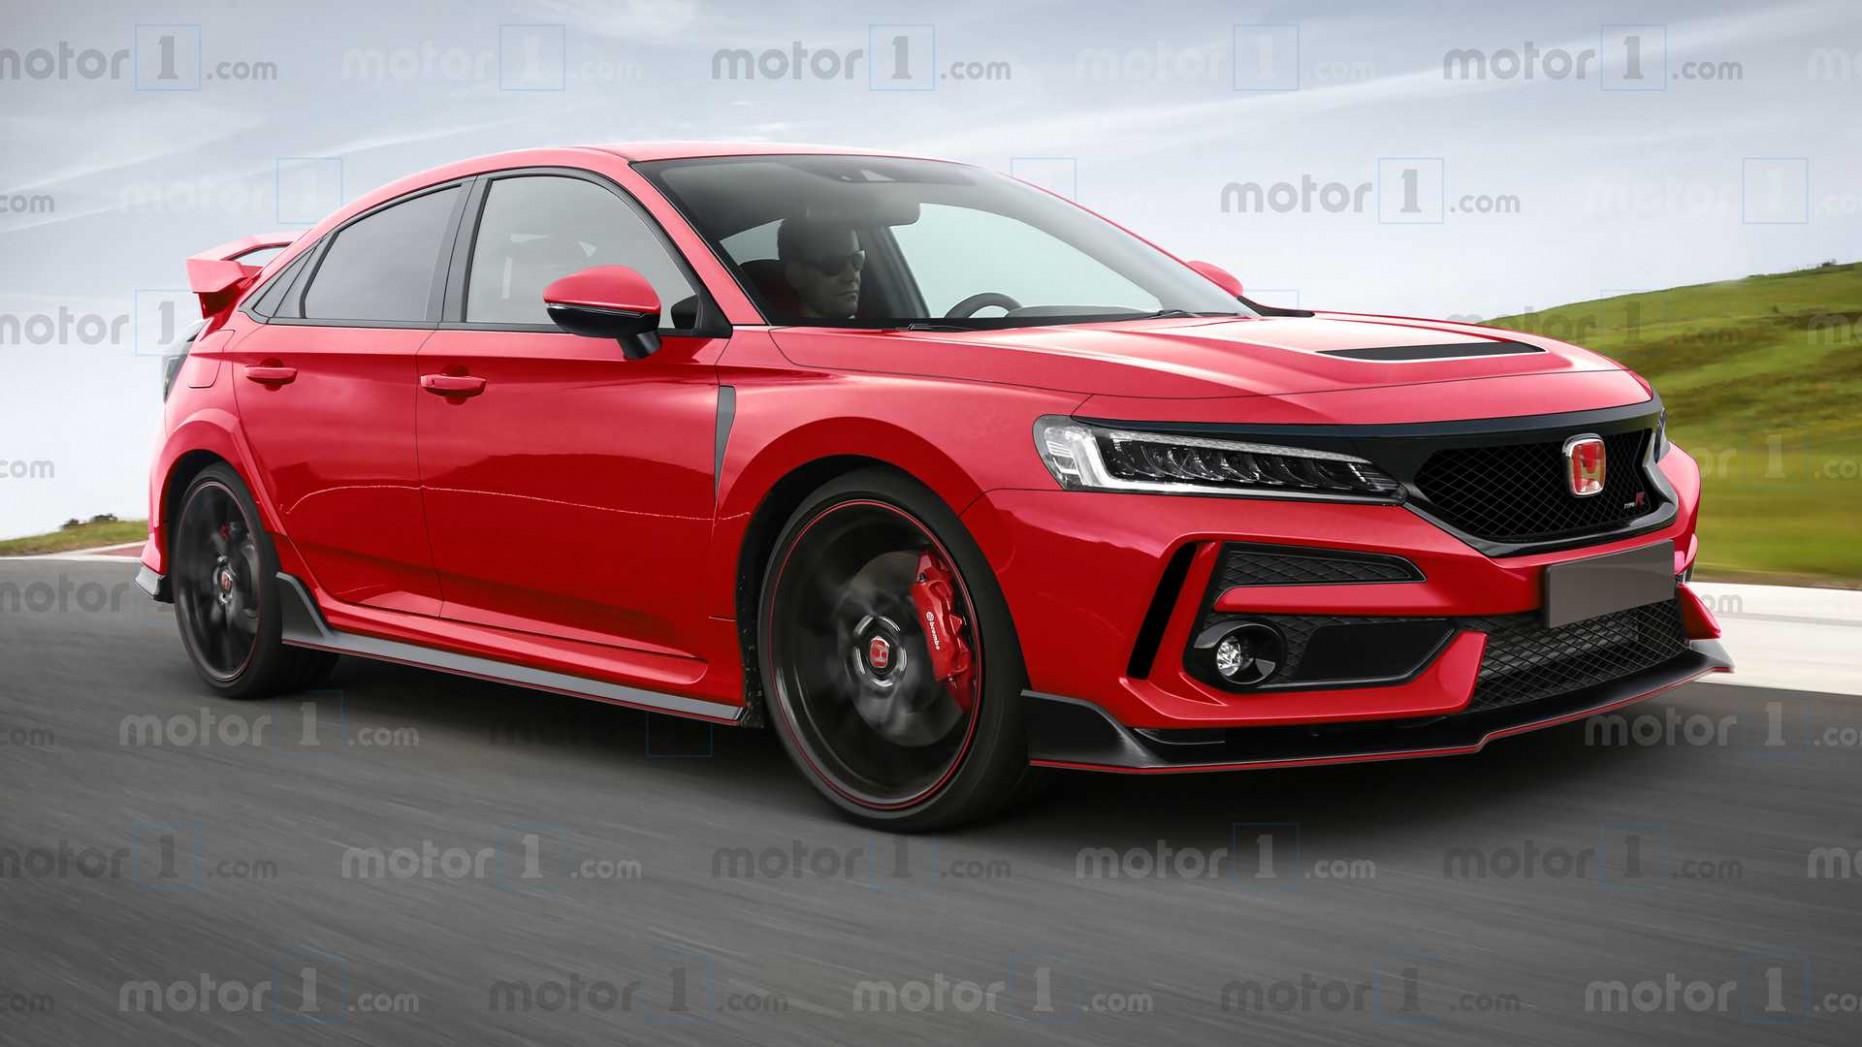 Images 2022 Honda Civic